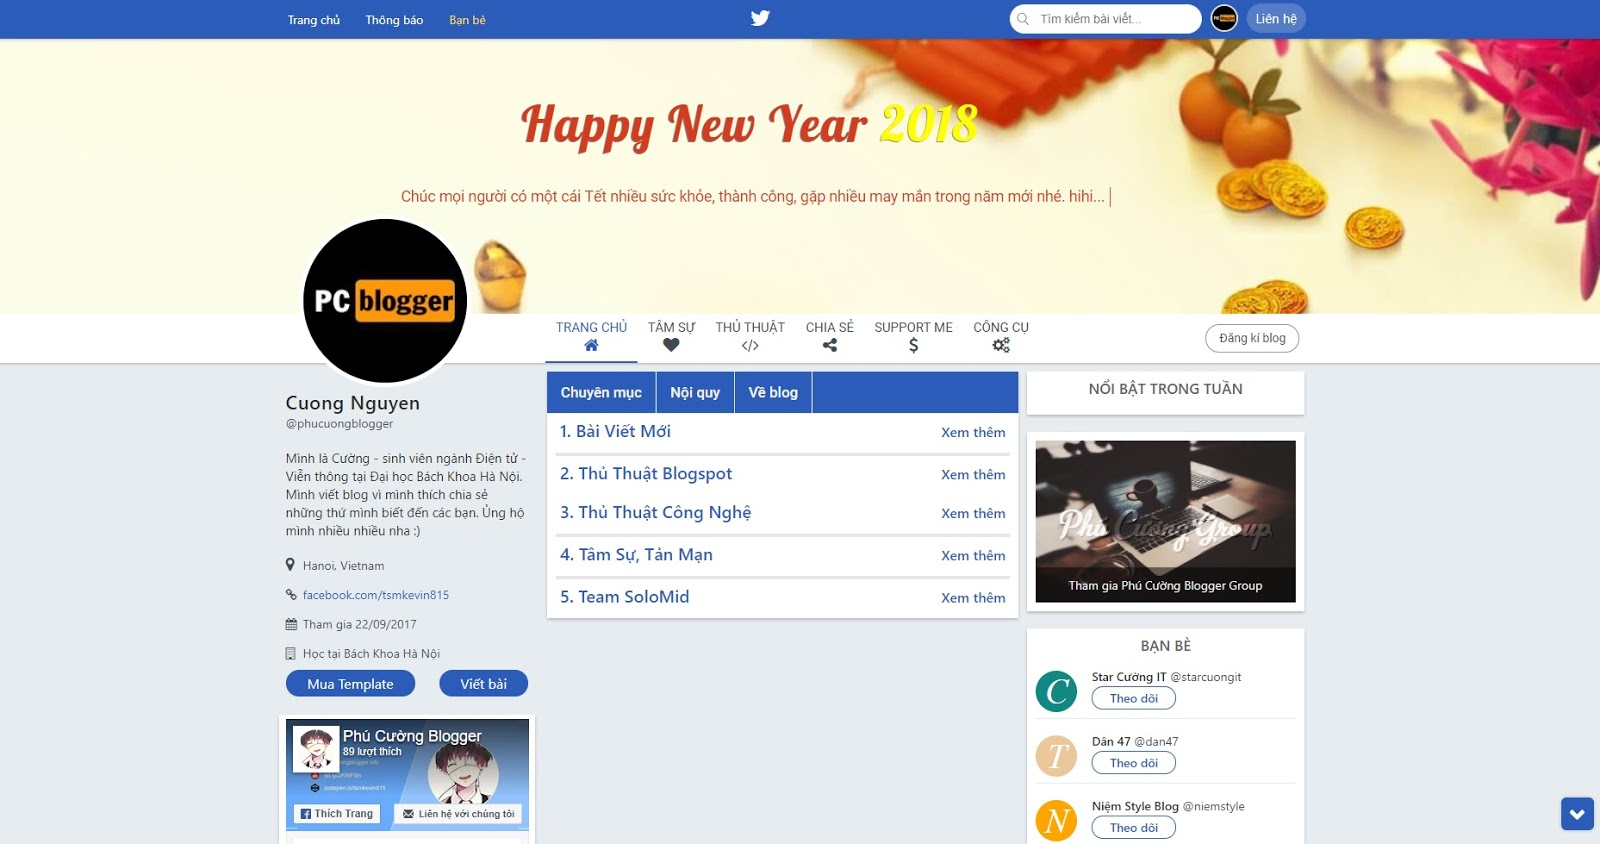 Share Template Twitter 4.5 Phú Cường Blogger